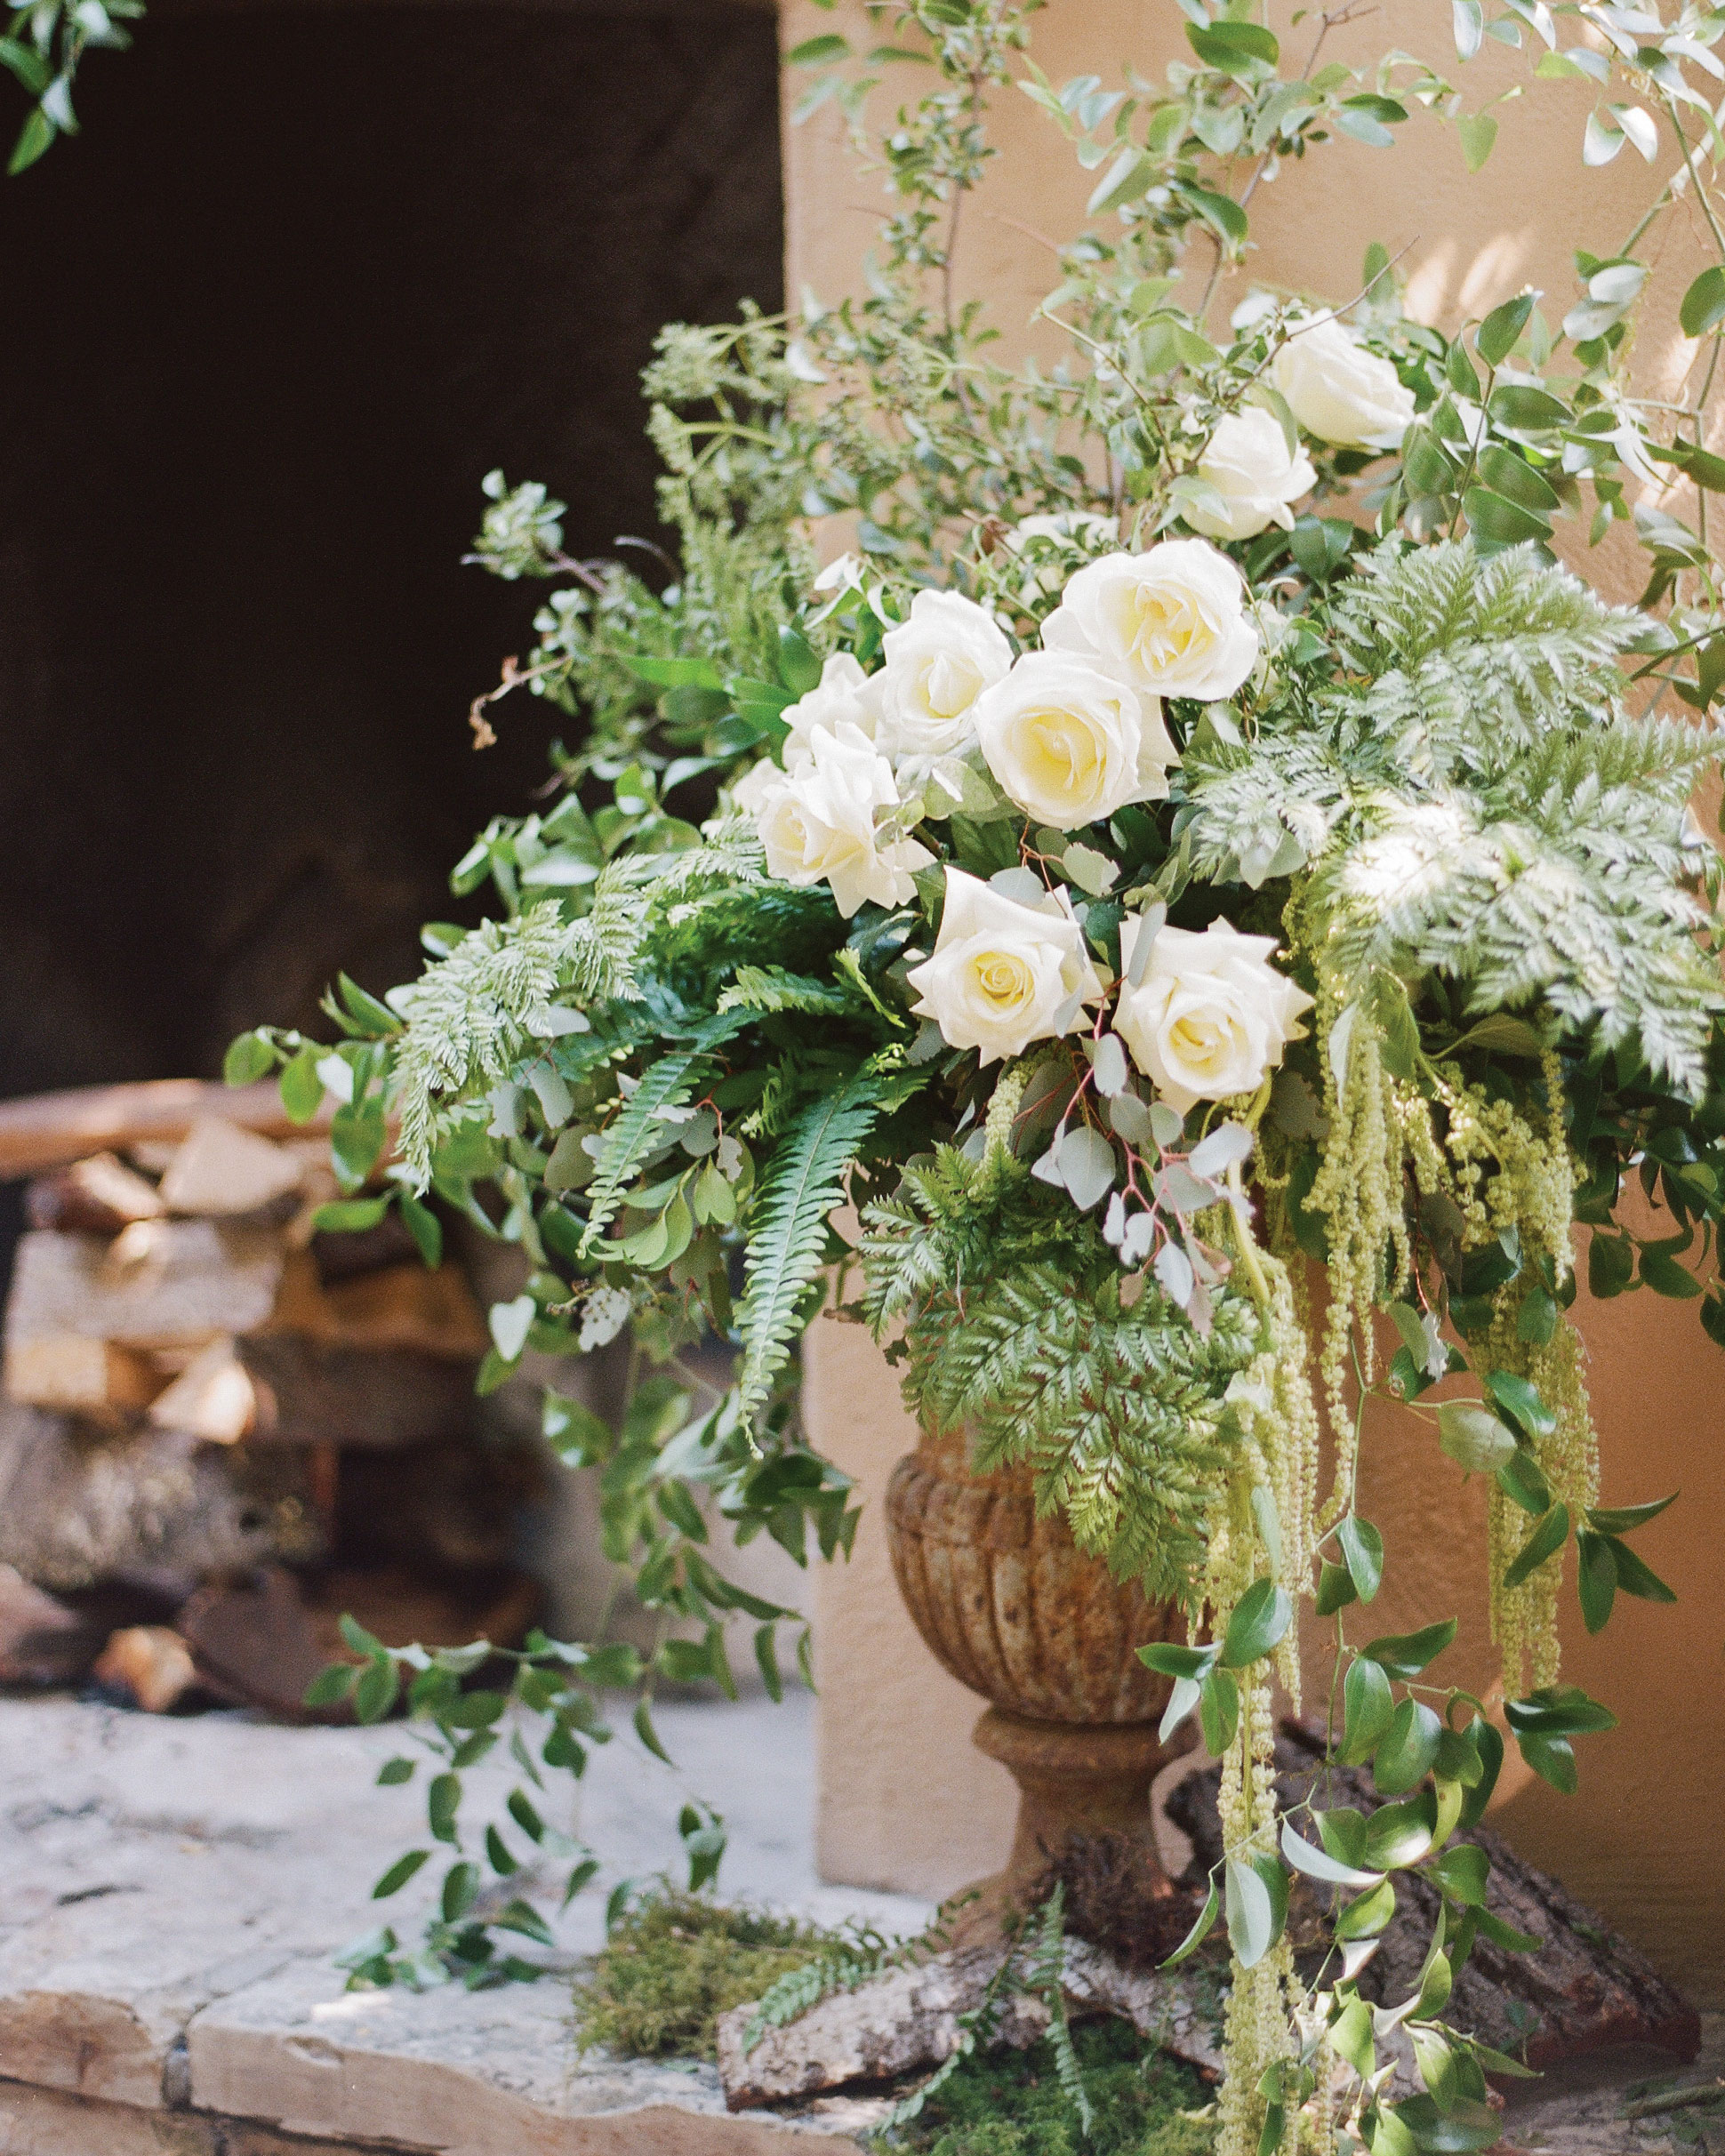 breelayne-hunter-wedding-california-flower-arrangement-0030-s112849.jpg